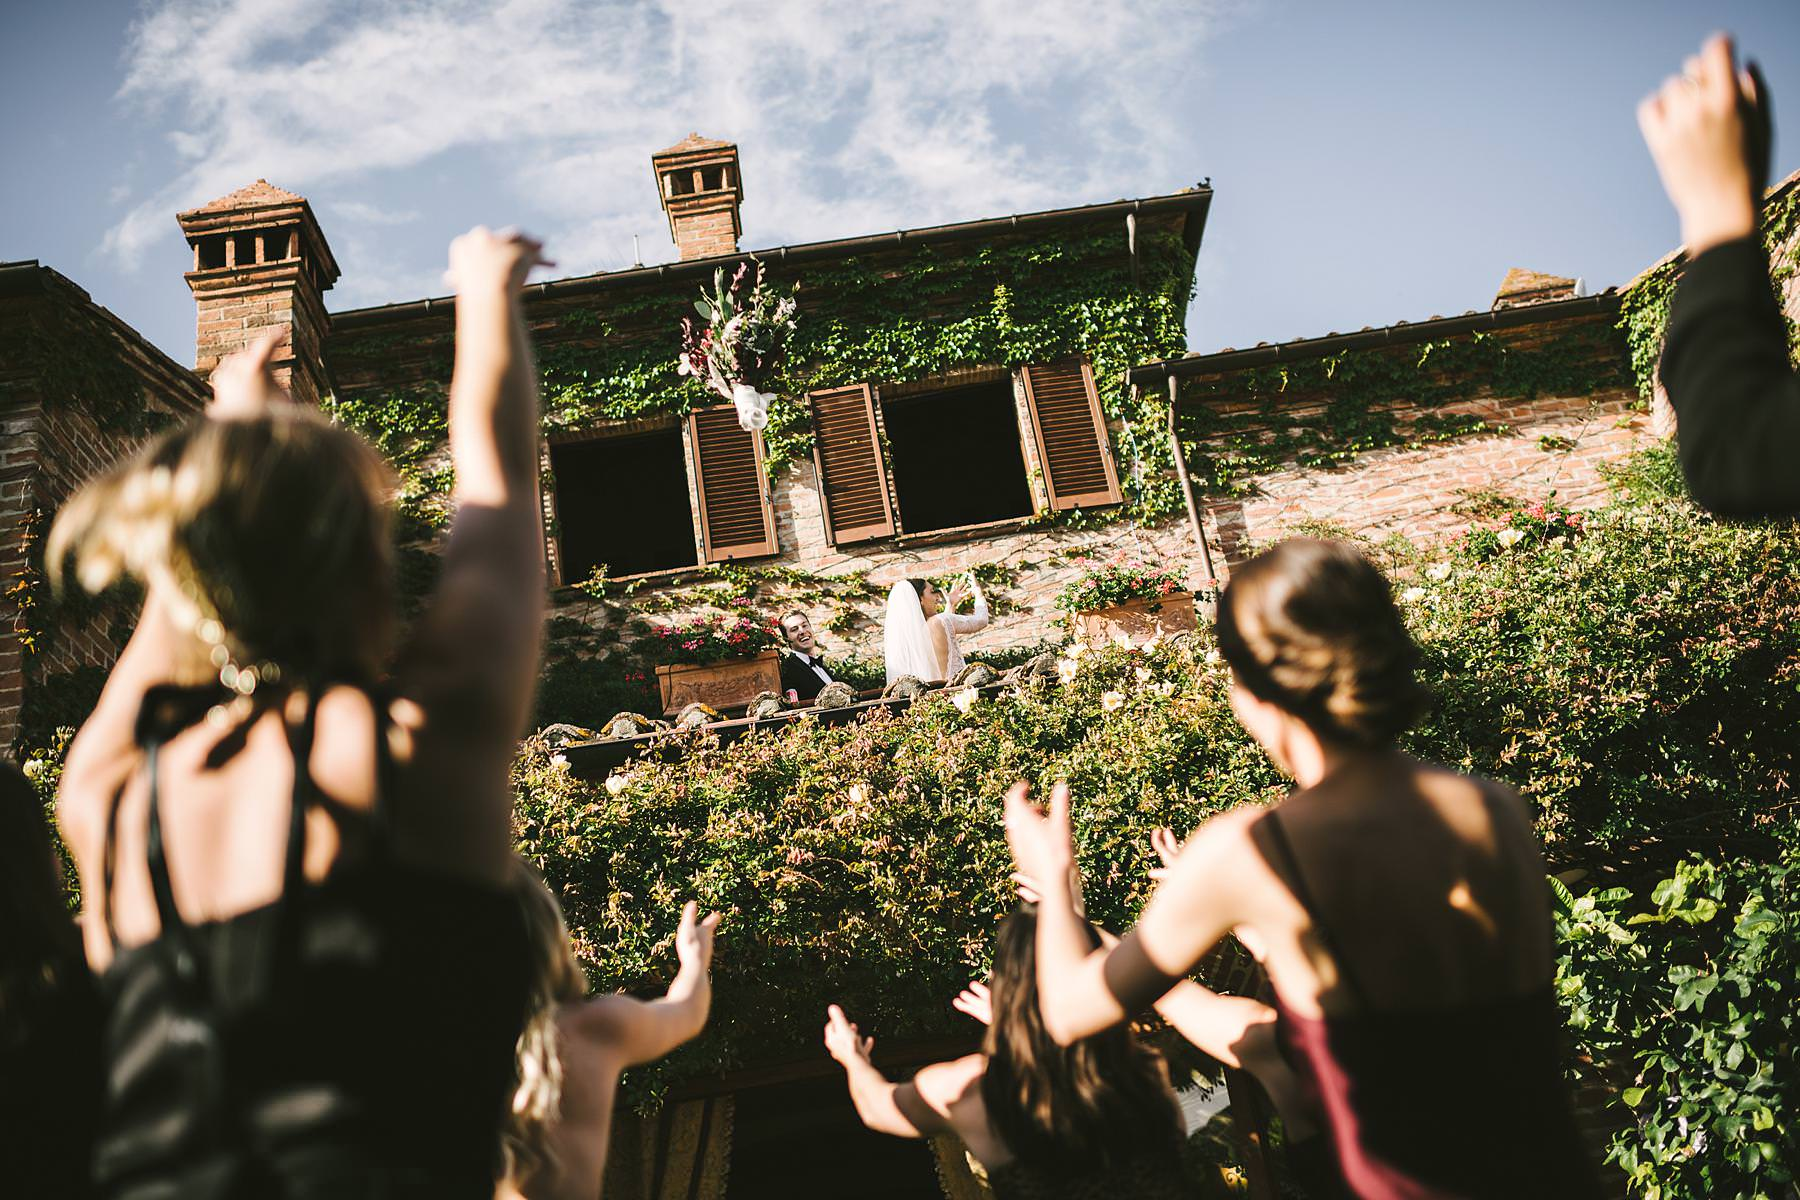 Destination wedding in Umbria at Villa l'Antica Posta, elegance and fun in a nutshell. Bridal bouquet toss